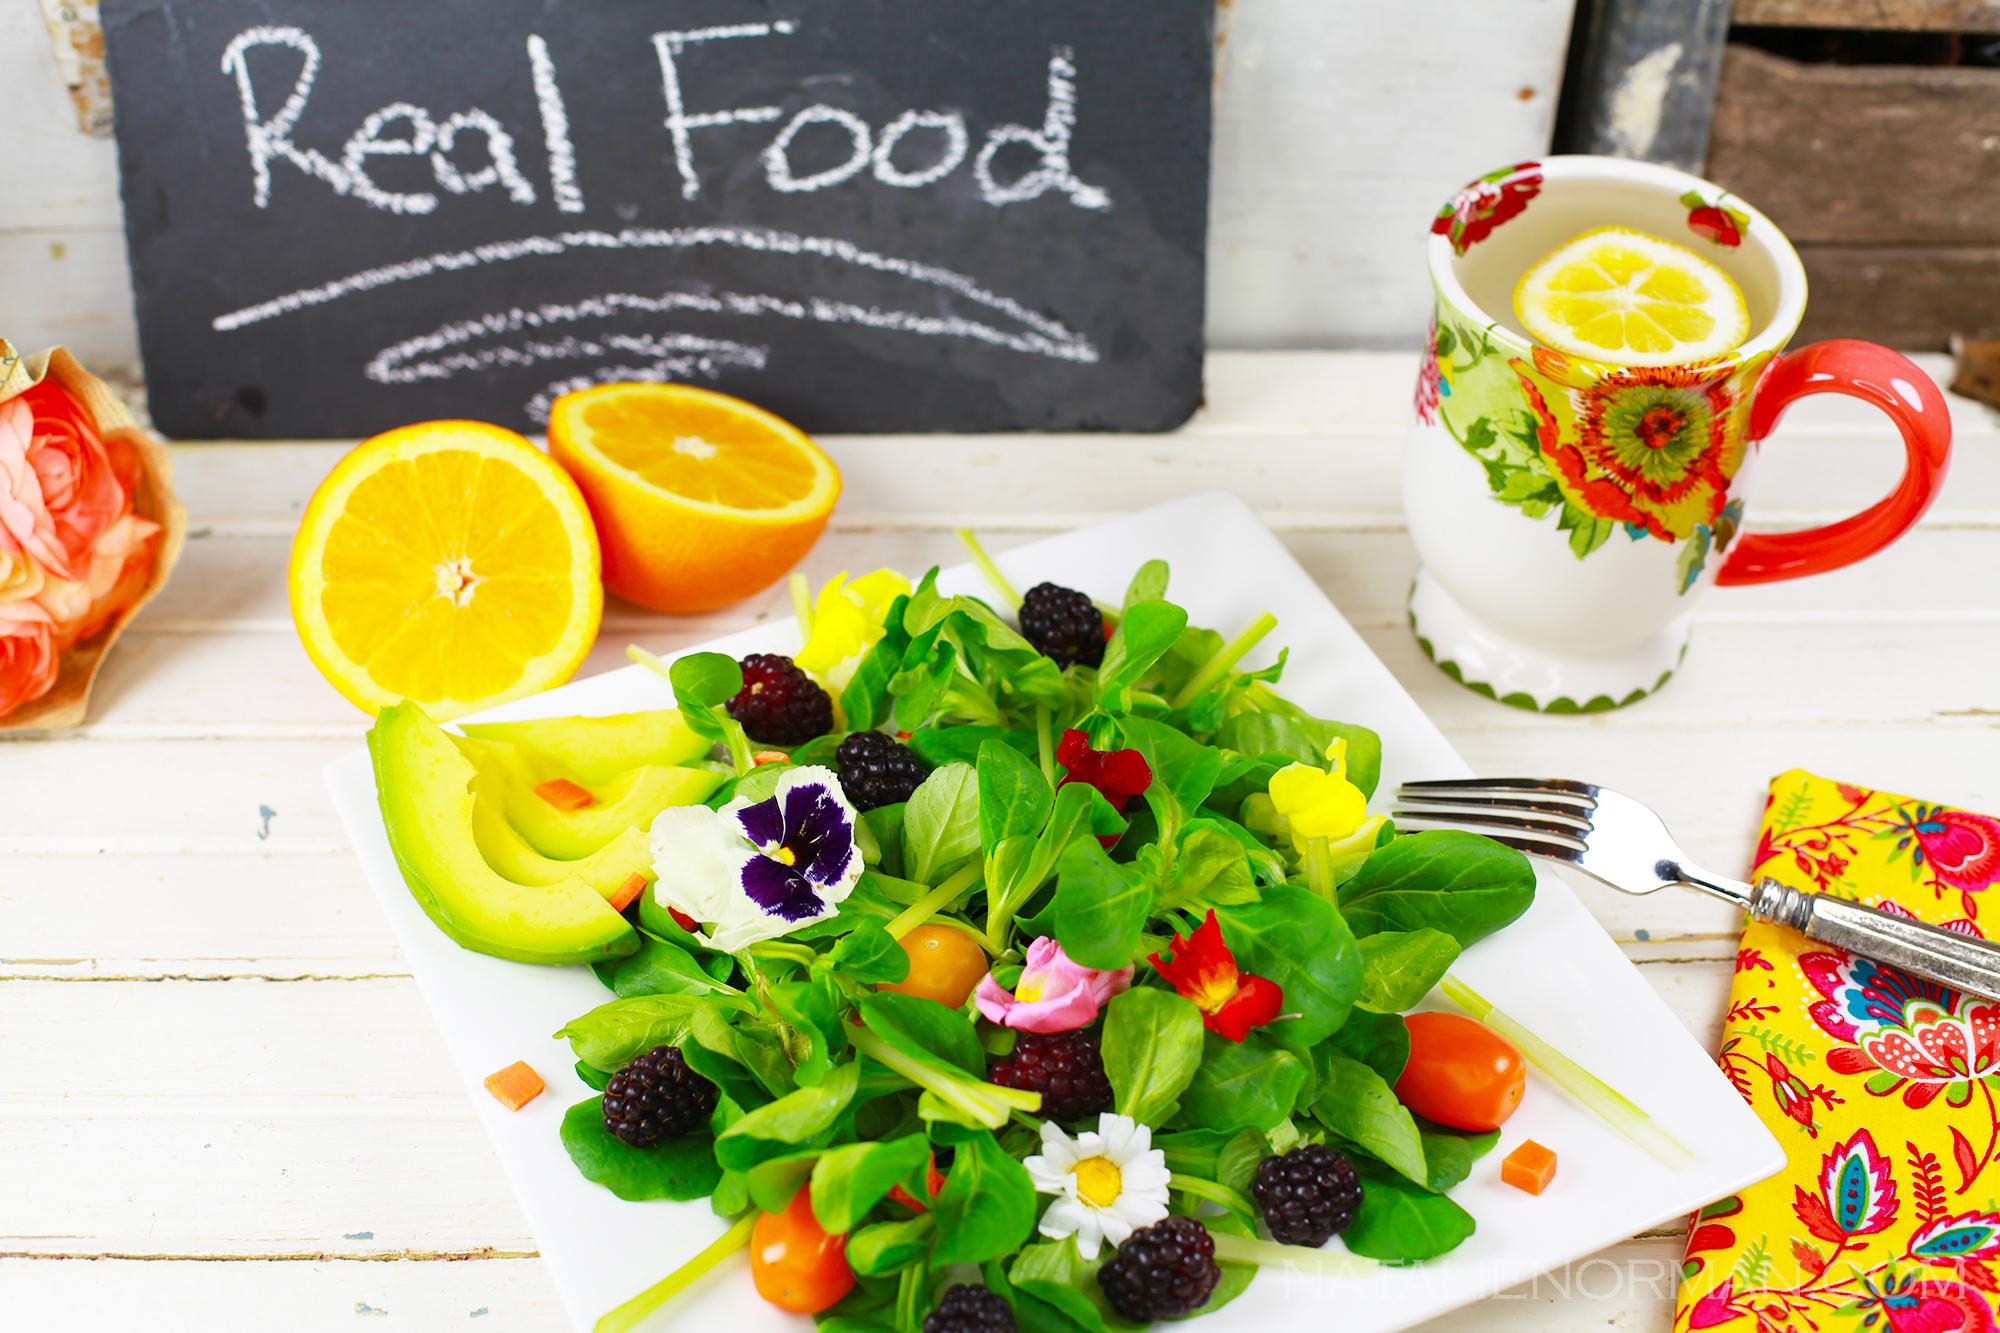 Edible Flower Salad with Mache and Blackberries - Natalie ...